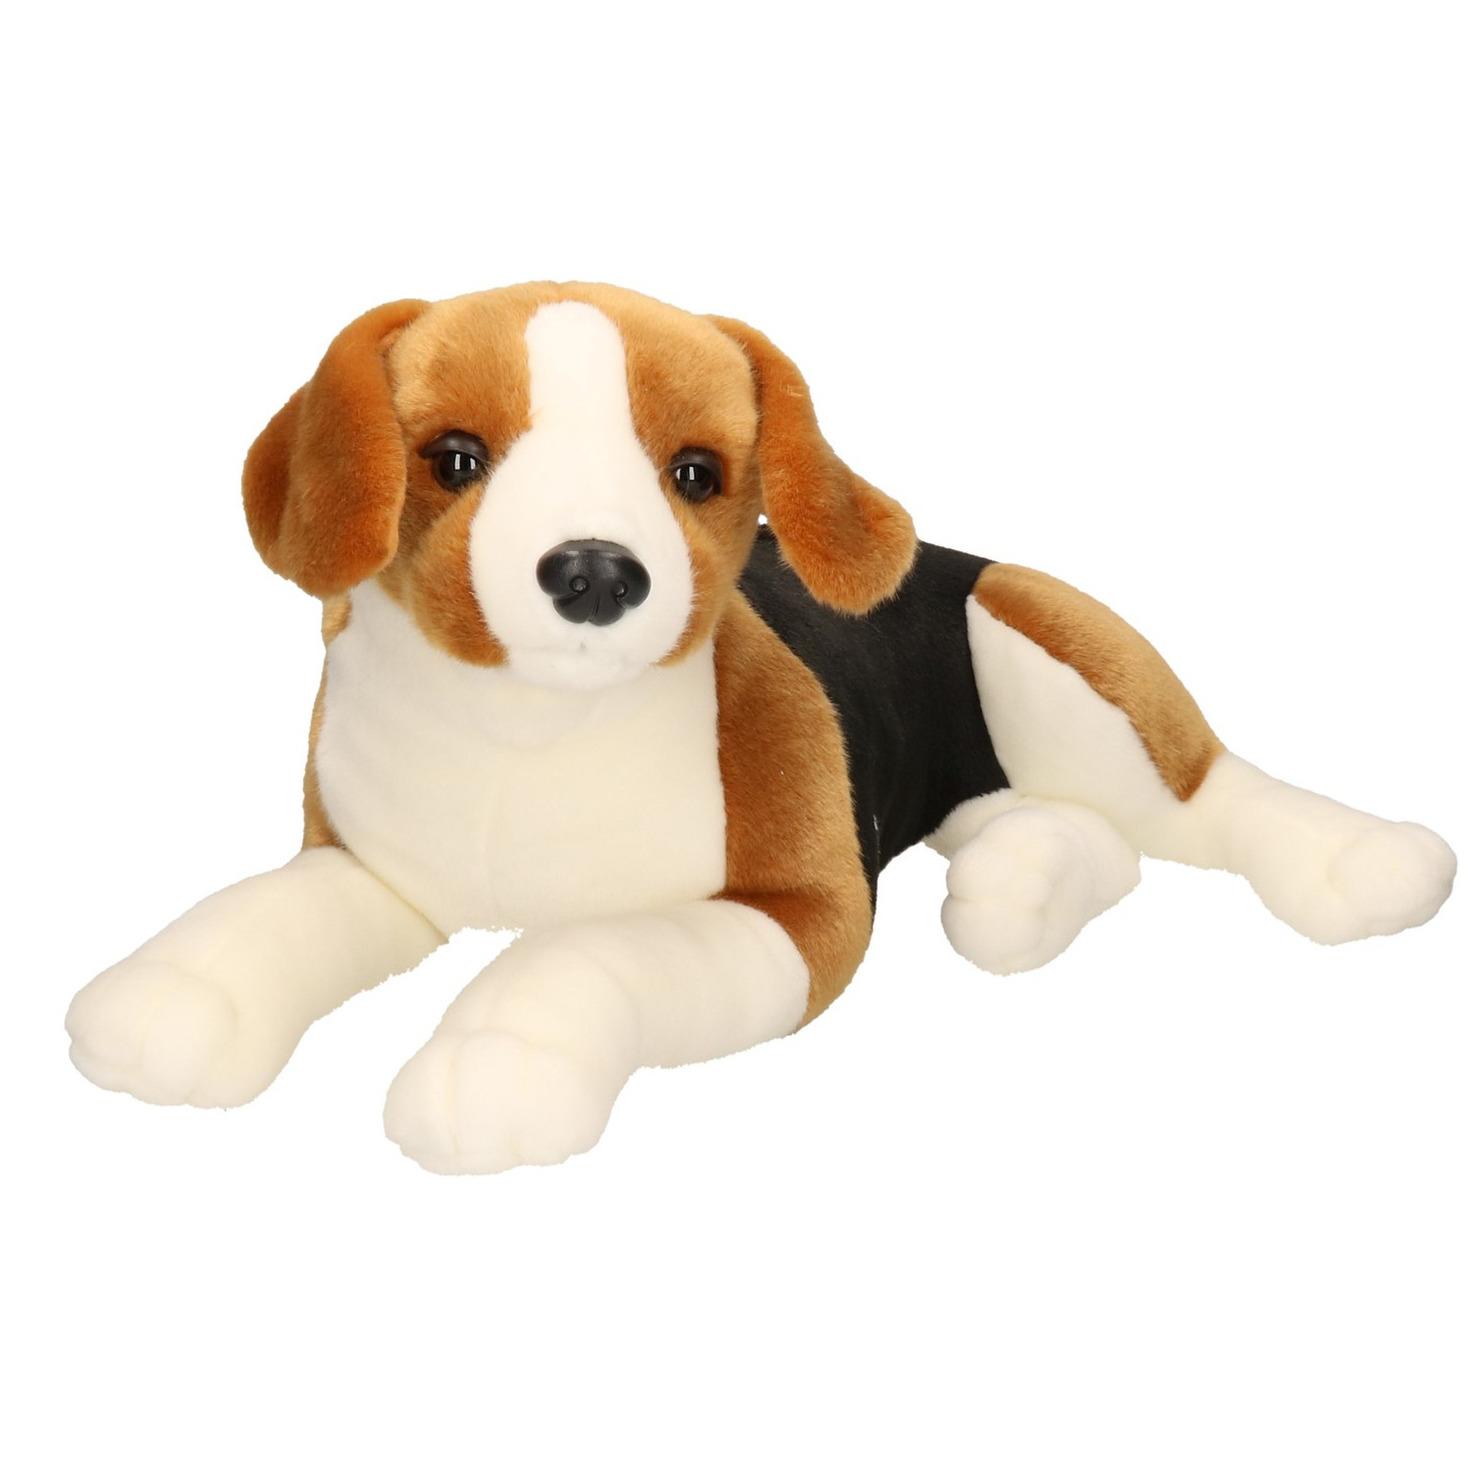 Grote bruin/zwarte honden knuffels 53 cm knuffeldieren